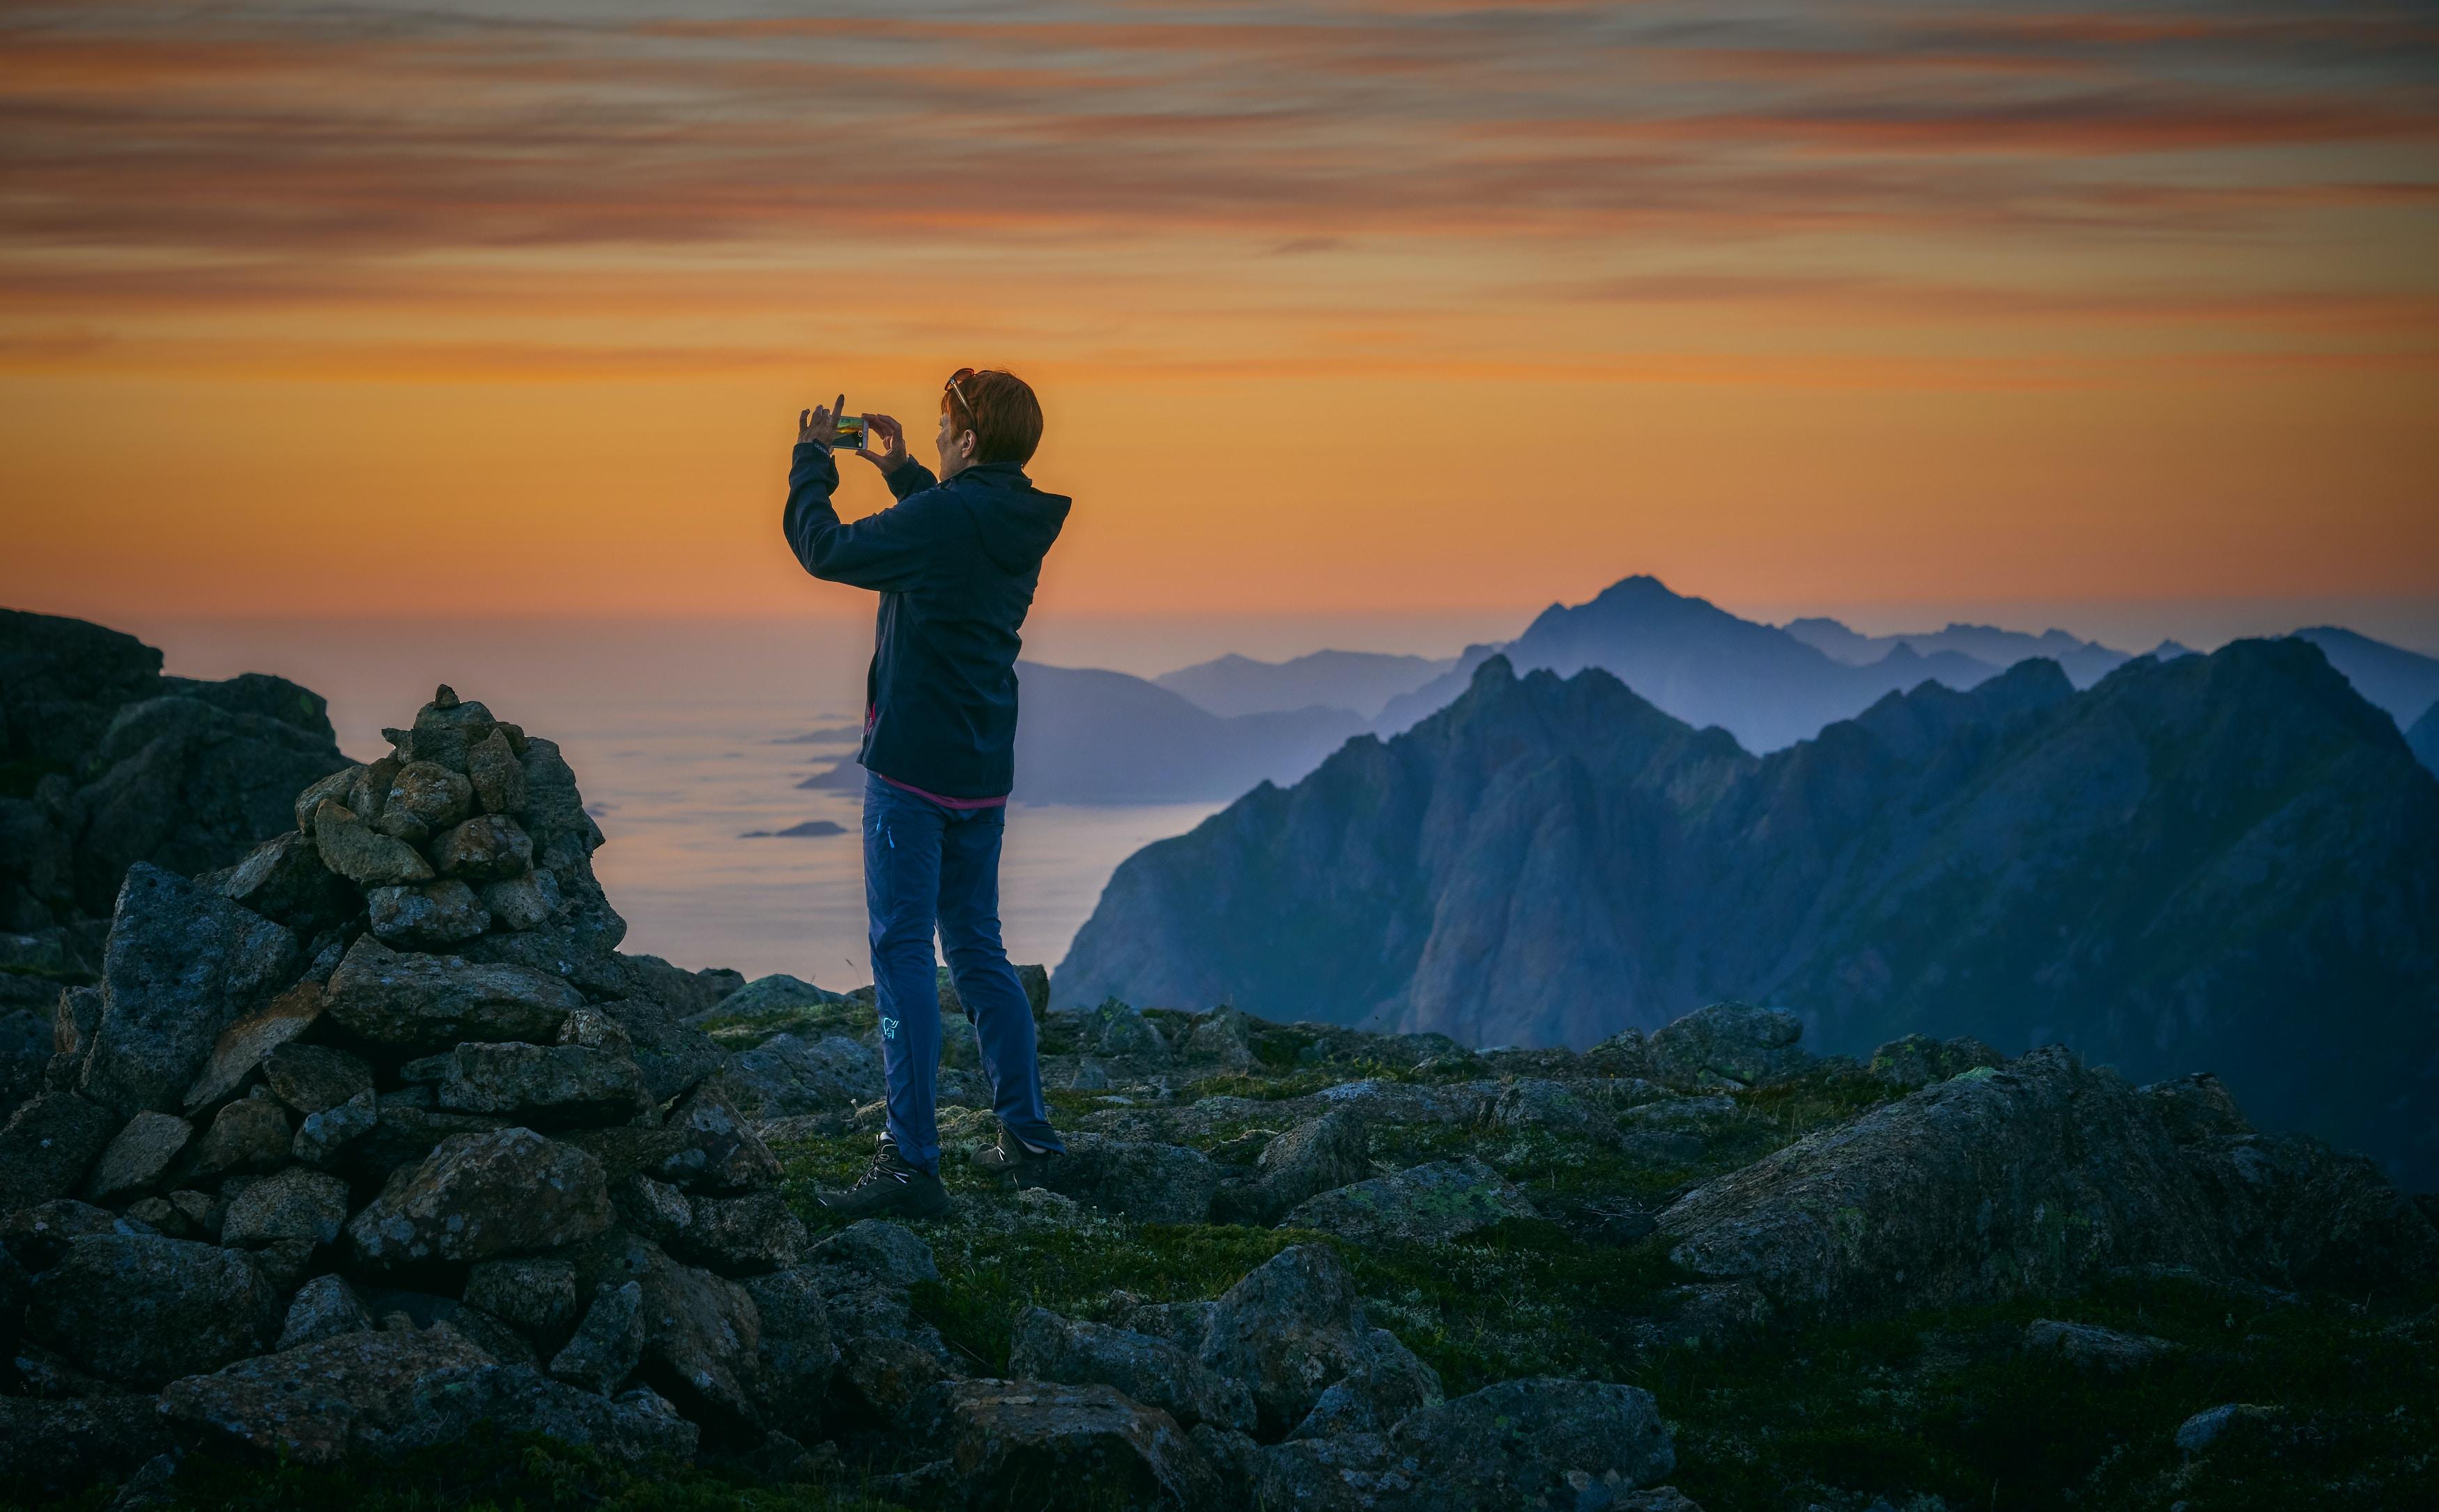 man standing on stones during daytime